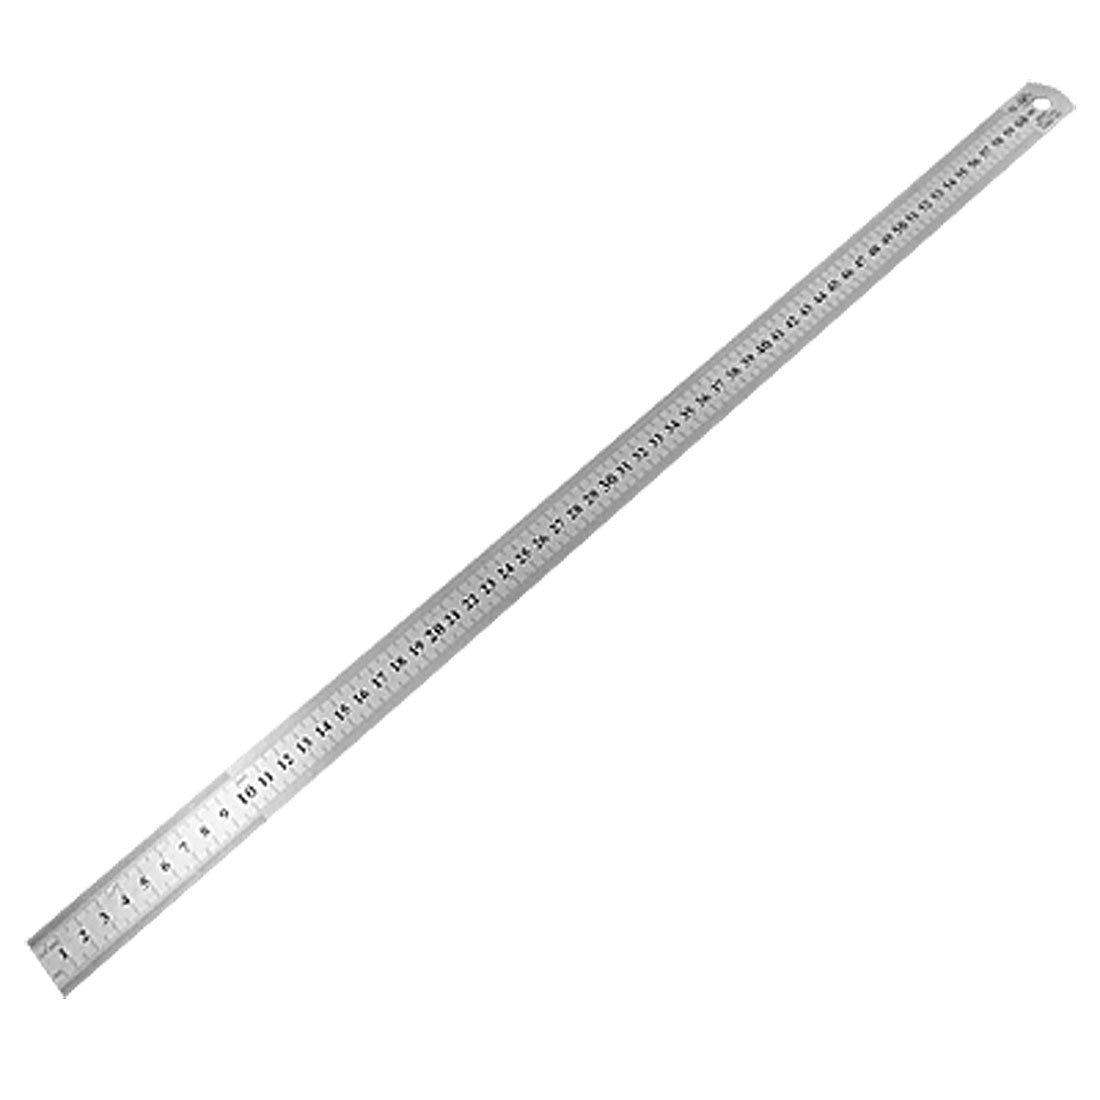 60cm Stainless Metal Measuring Straight Ruler